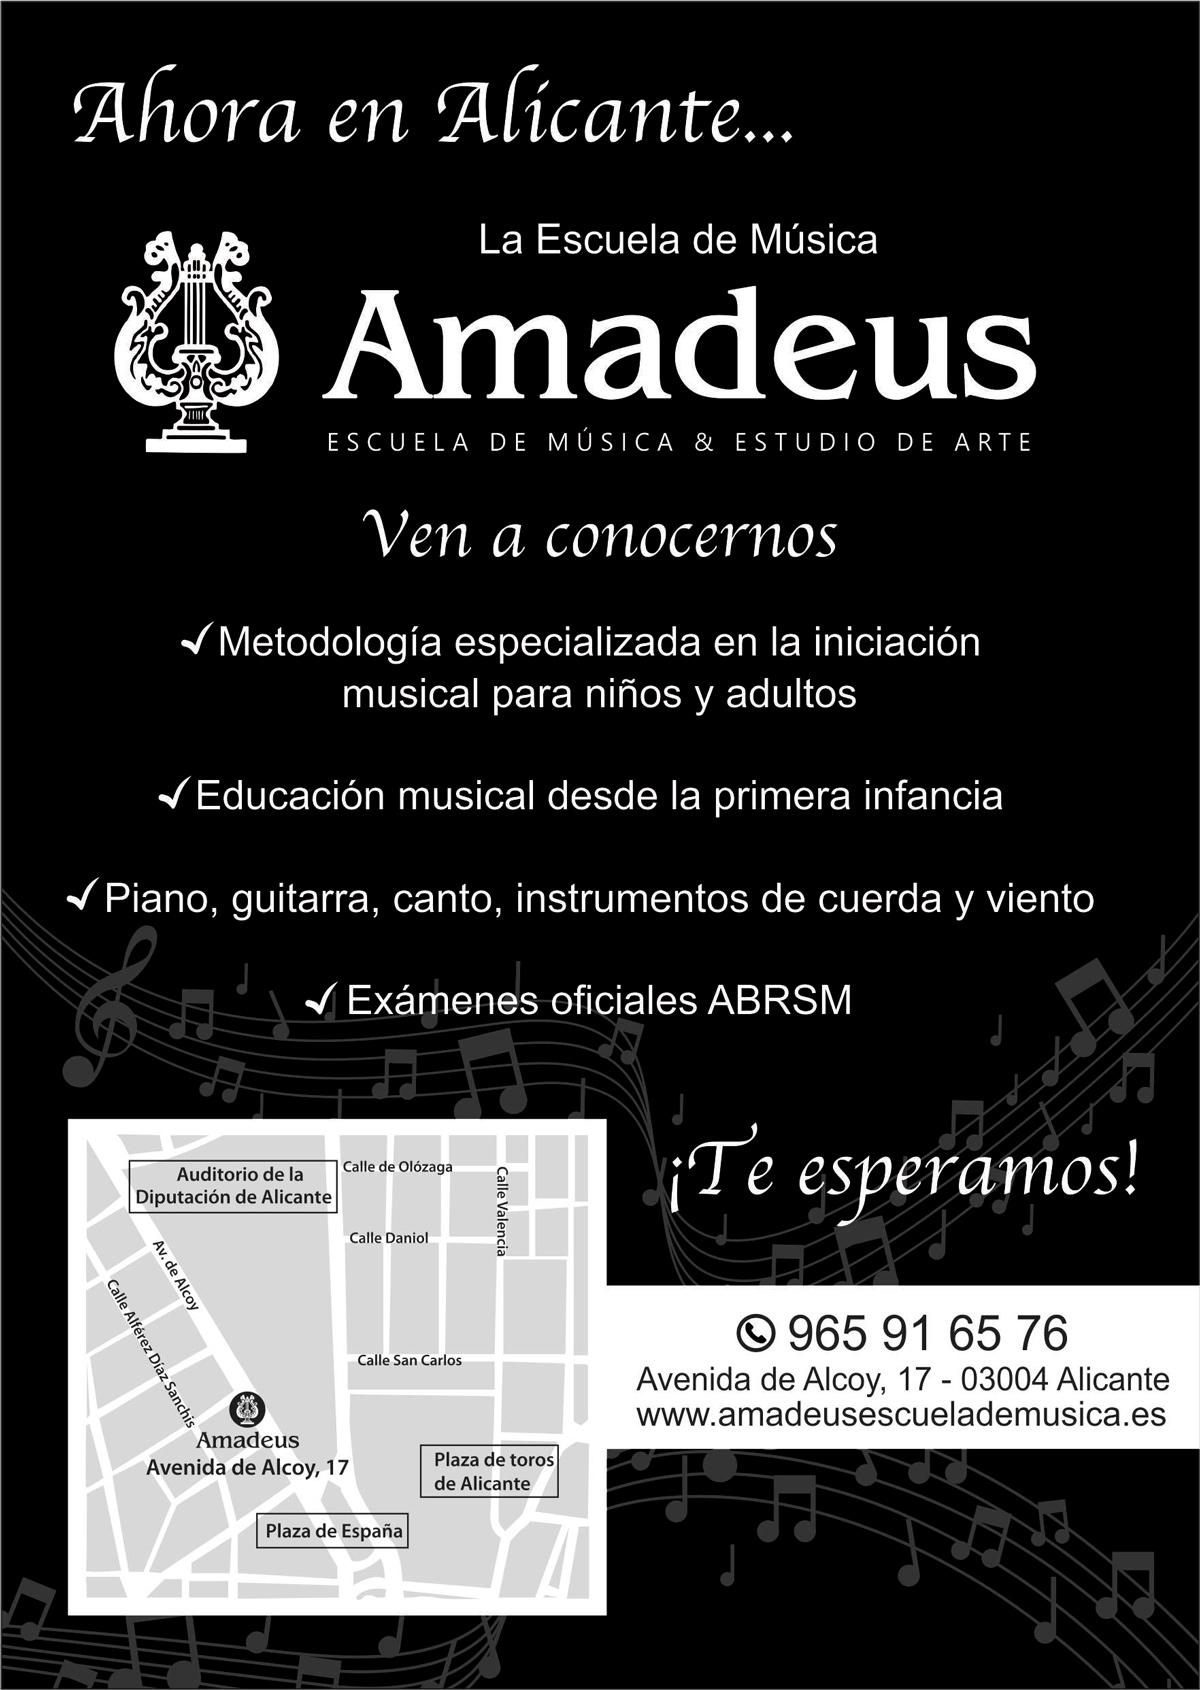 Flyer Amadeus Alicante 2